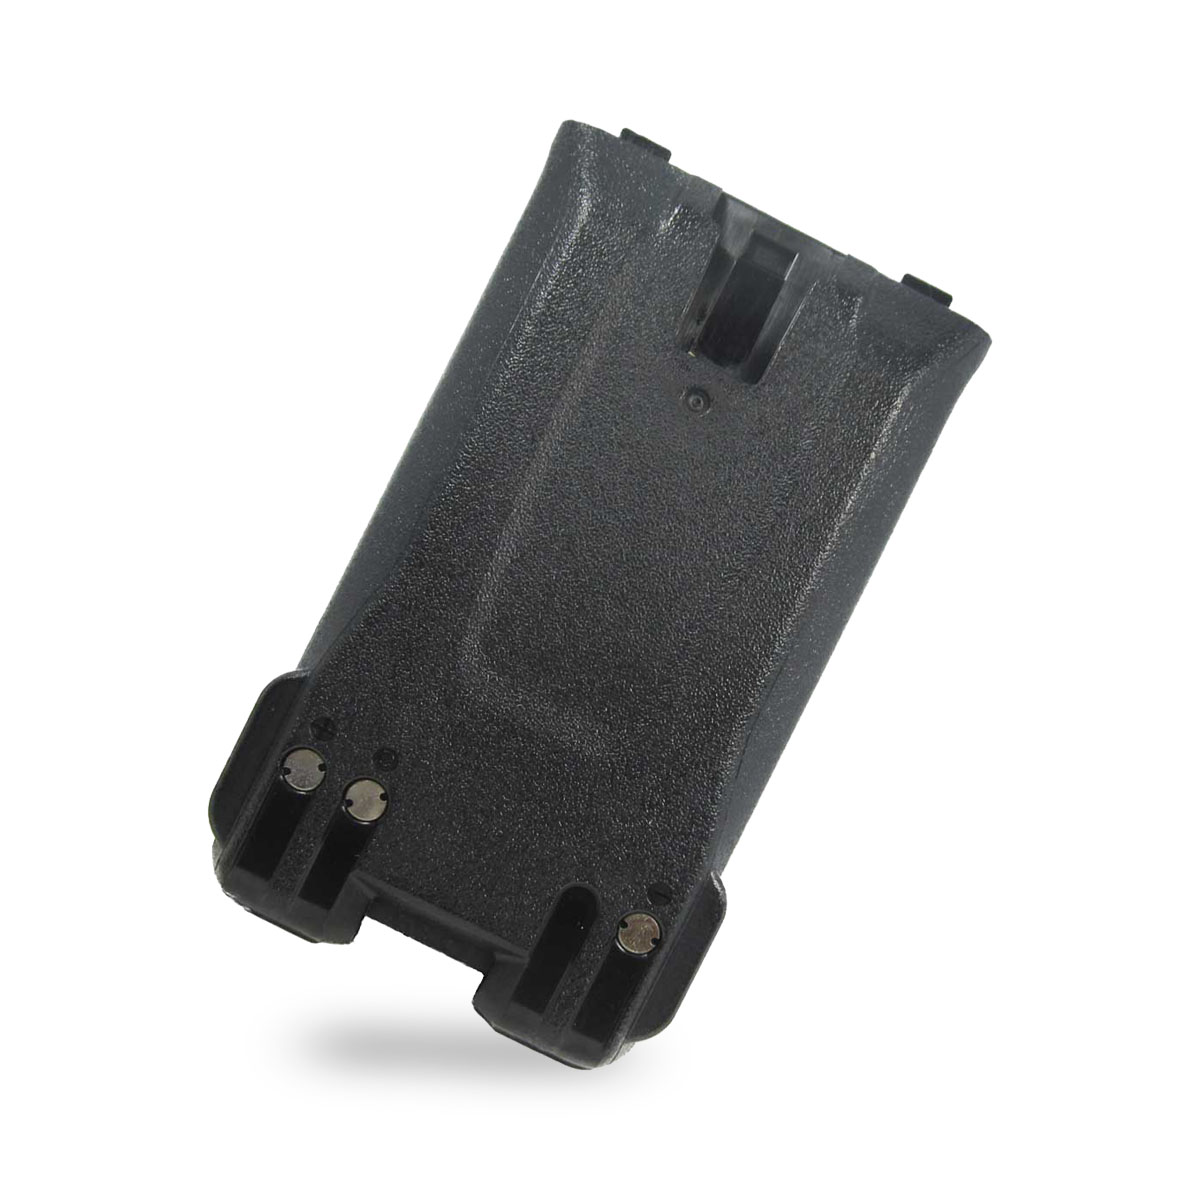 Batería Icom Ni-MH 1400 mAh para radios IC-F3003 y IC-F4003 BP-264